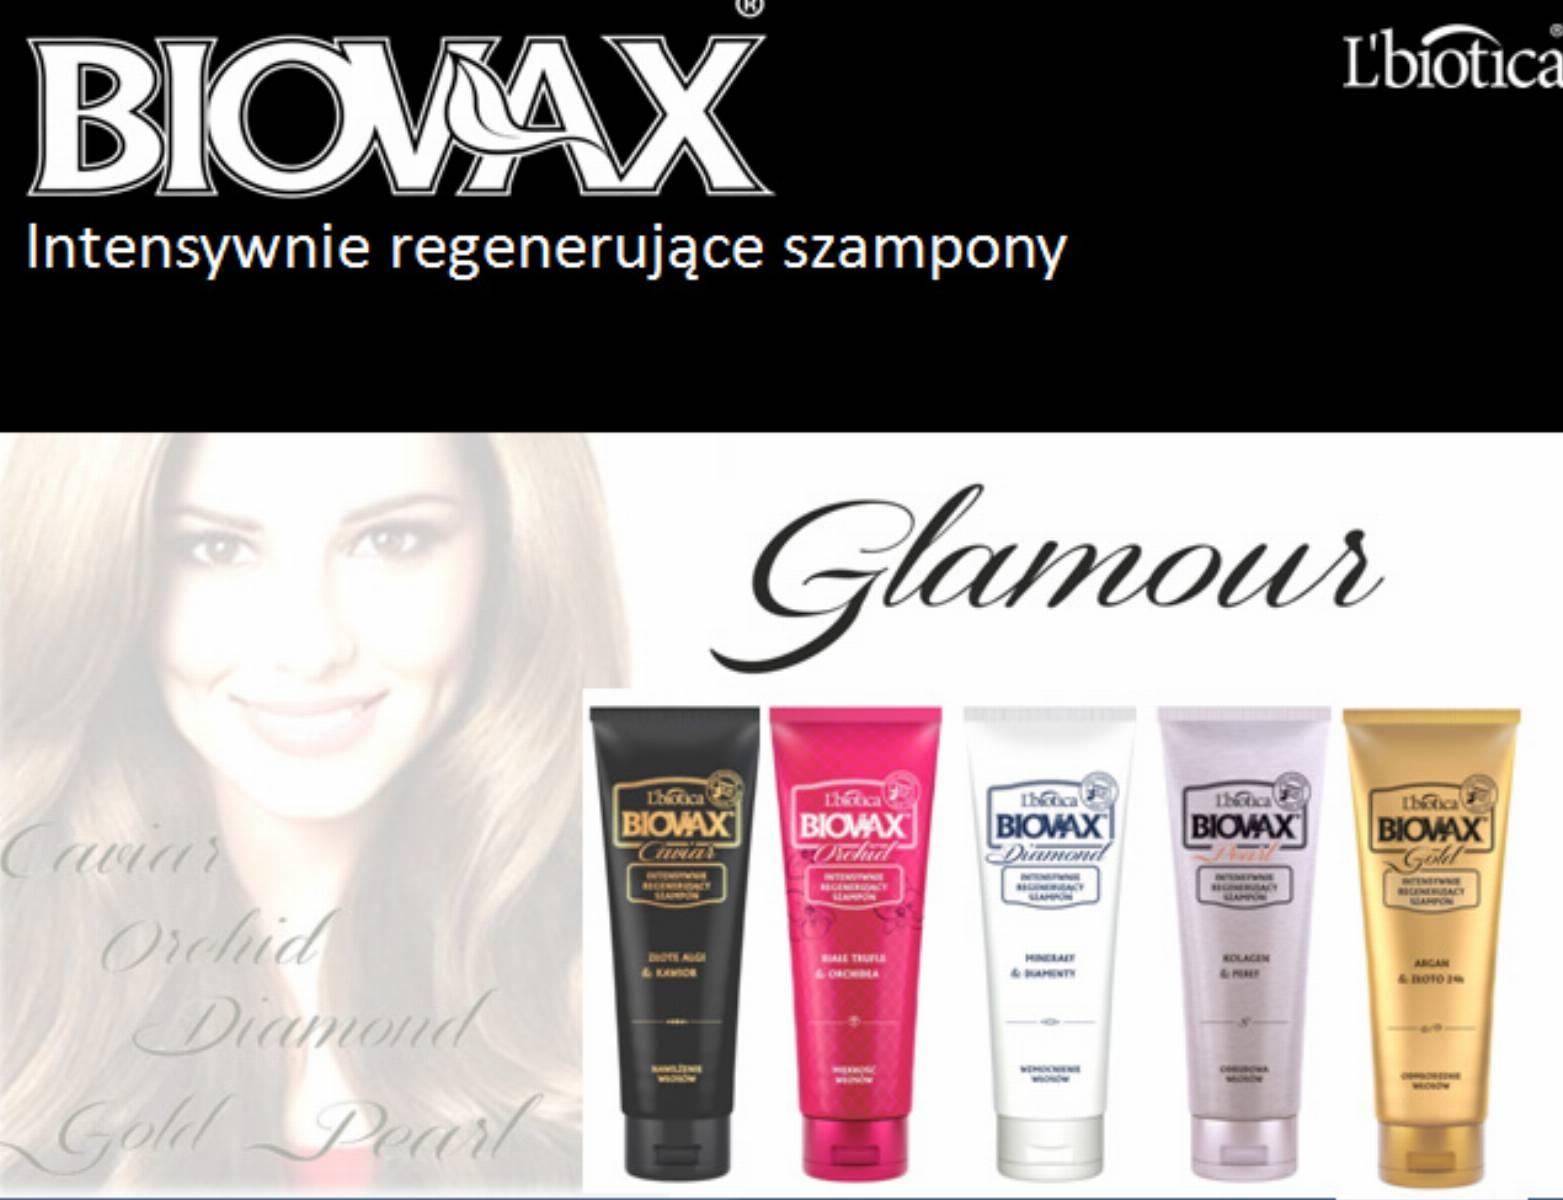 bivax glamour